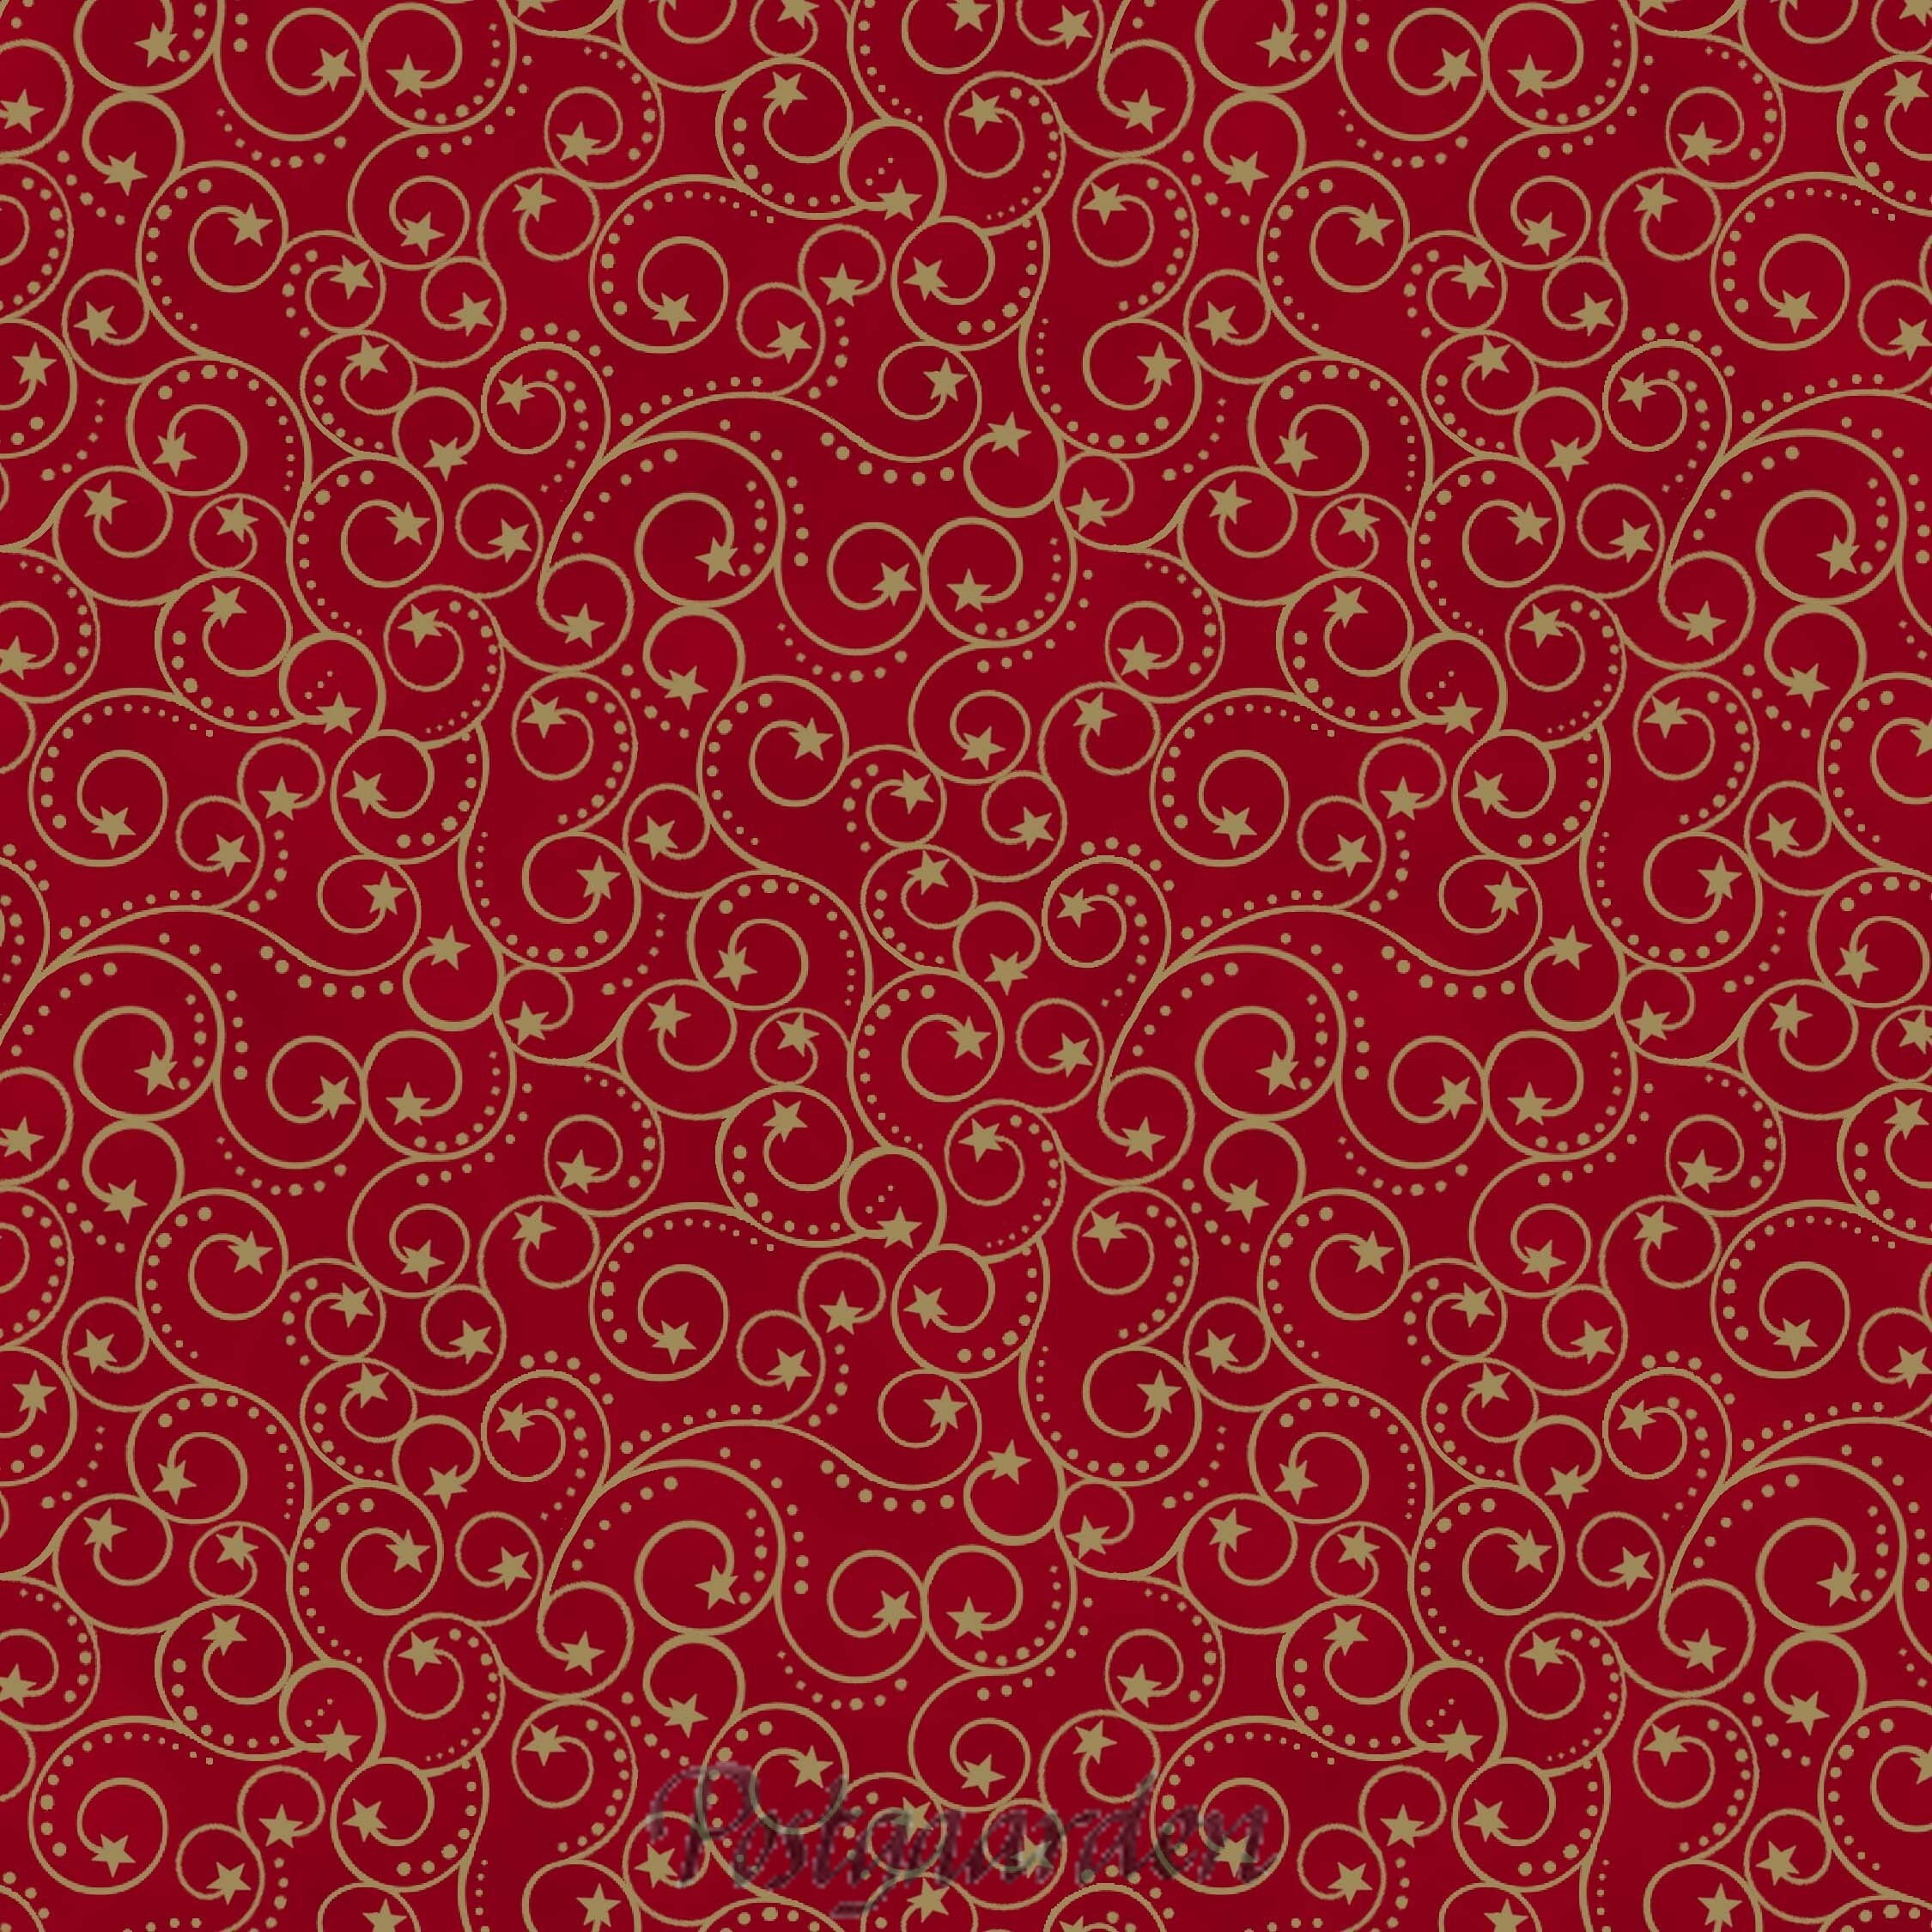 7441 FQ7441 - Rød m. guldsnirkler - JUL patchwork stof